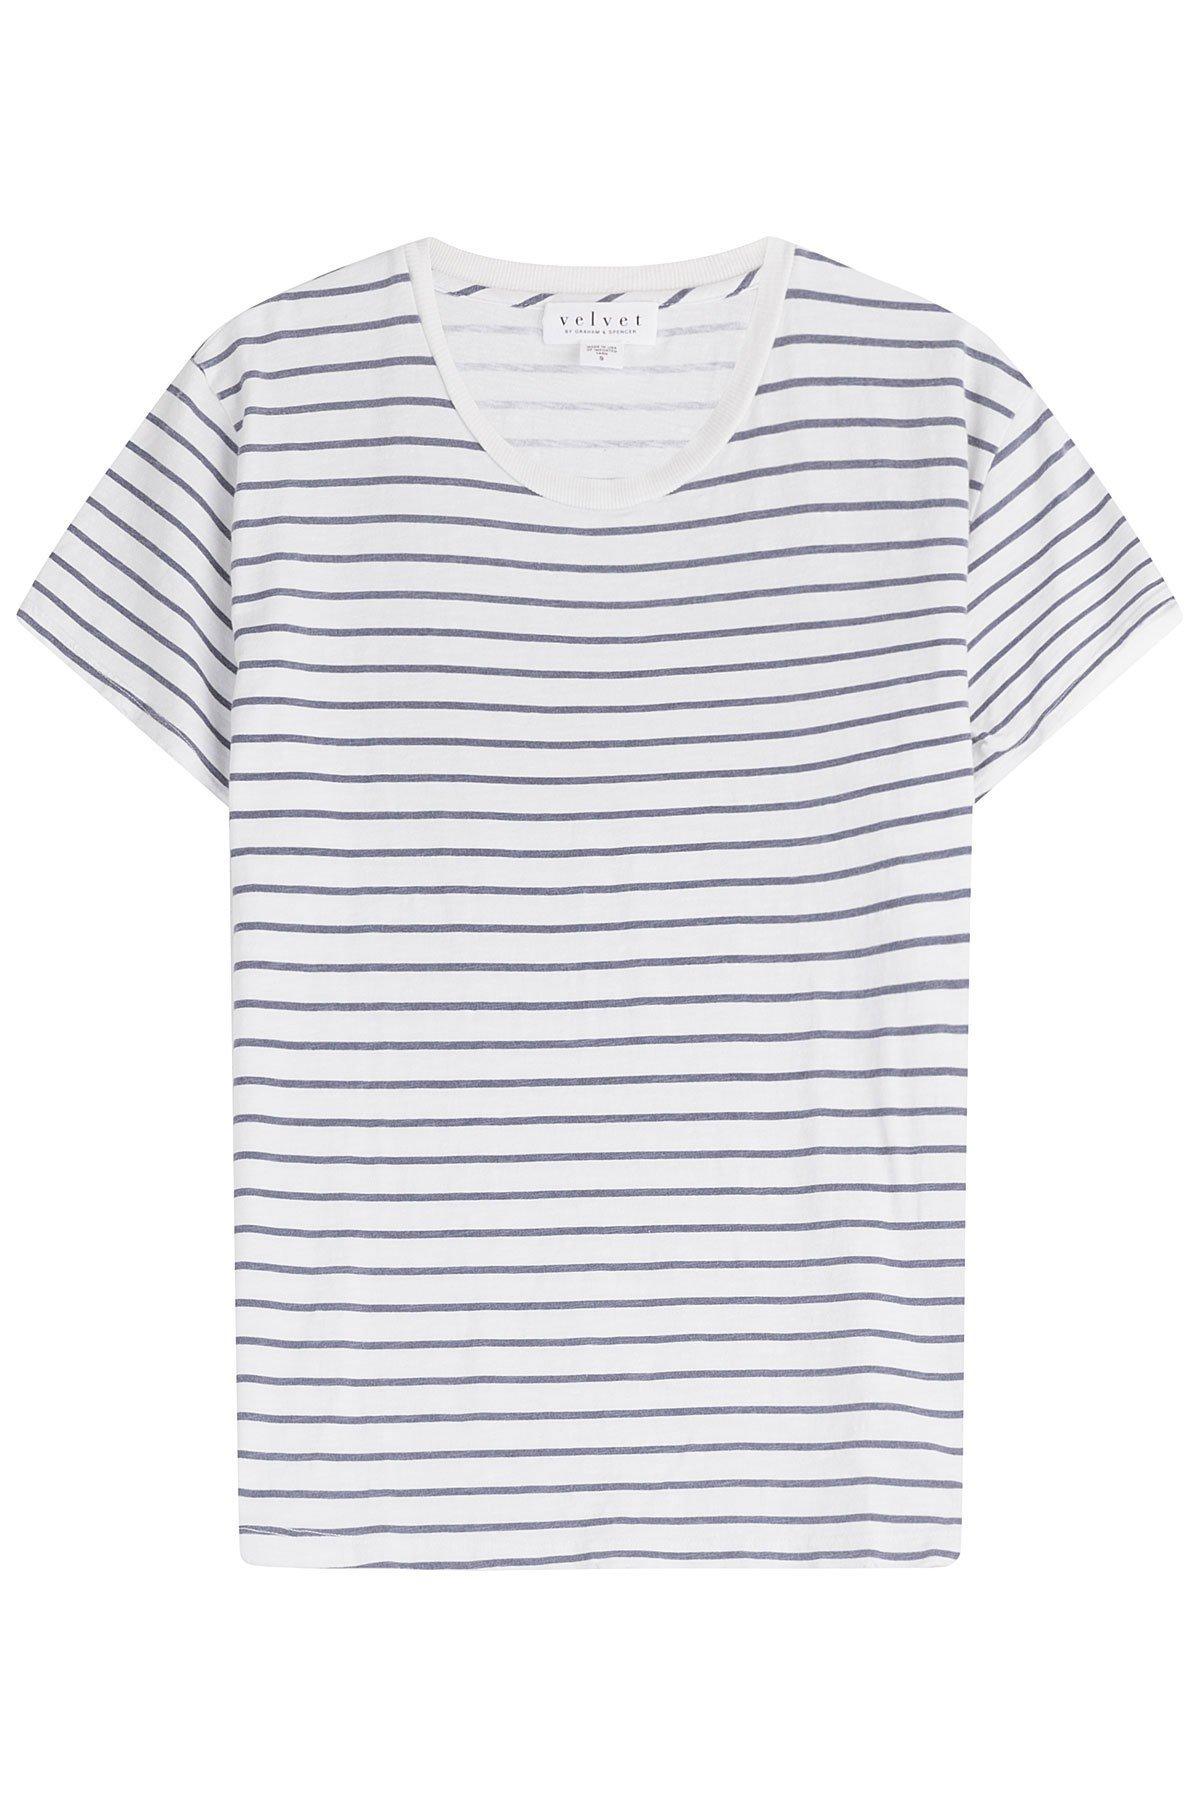 Henni Striped Cotton T-Shirt Gr. S